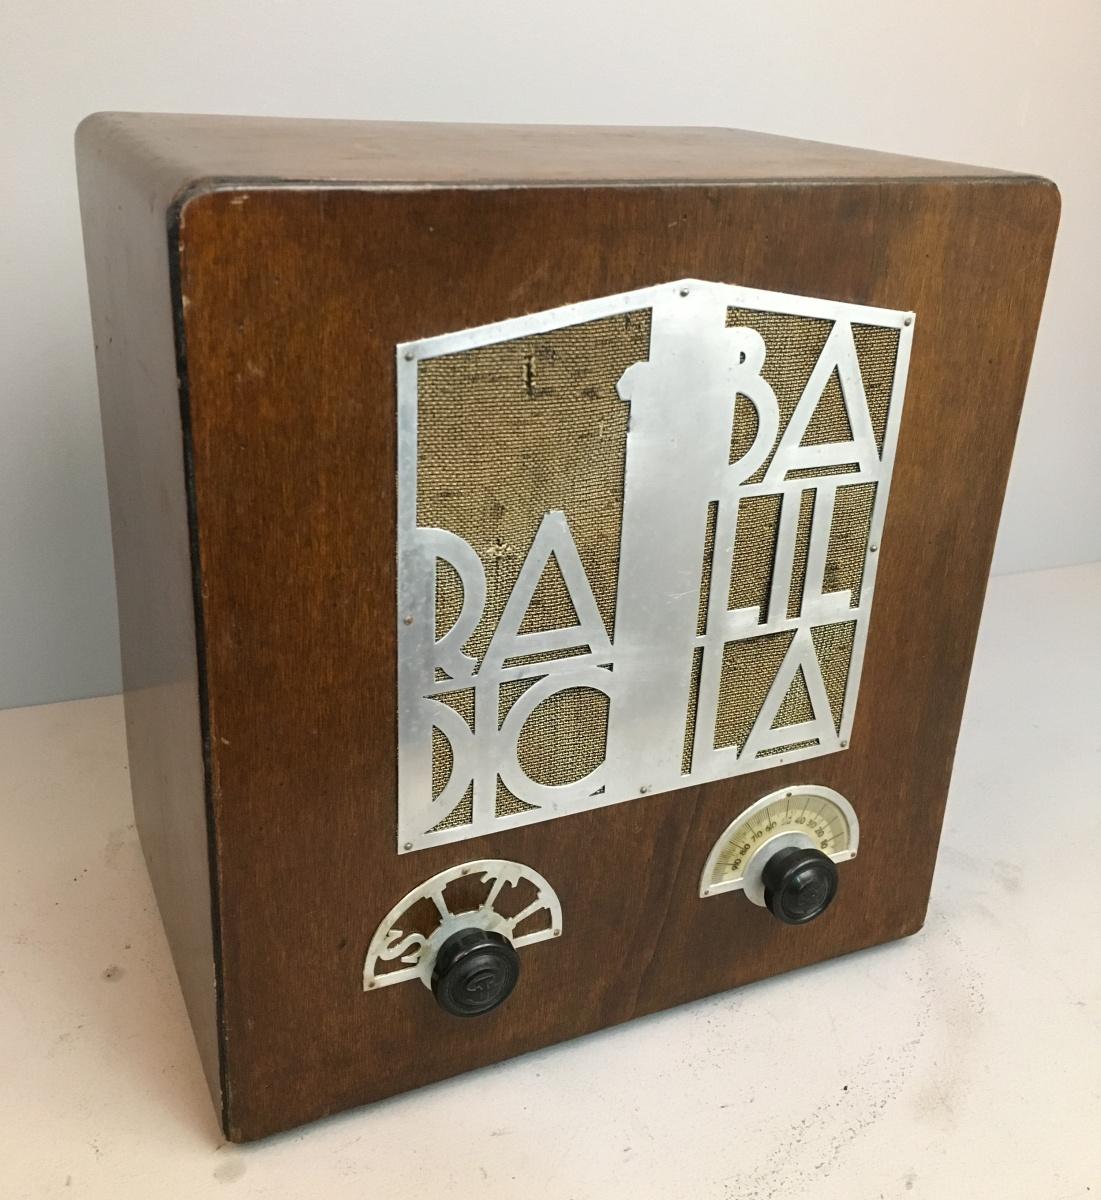 S.I.T.I. radio balilla.